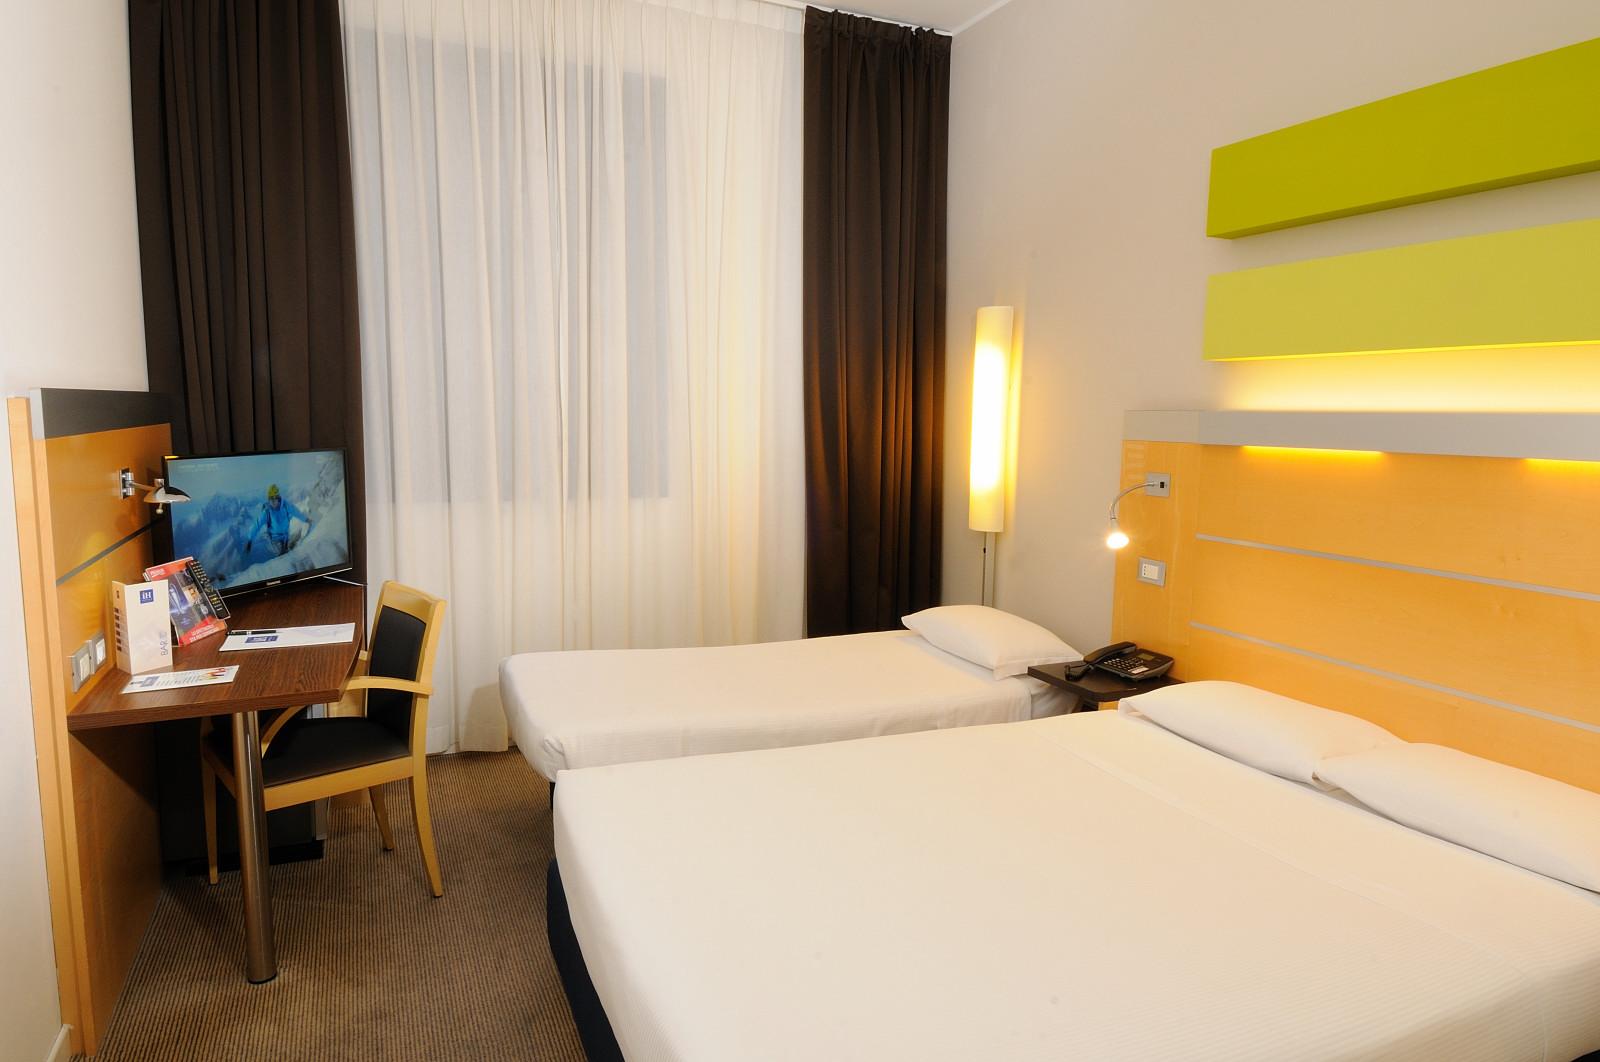 IH Hotels Milano Gioia - Triple Room